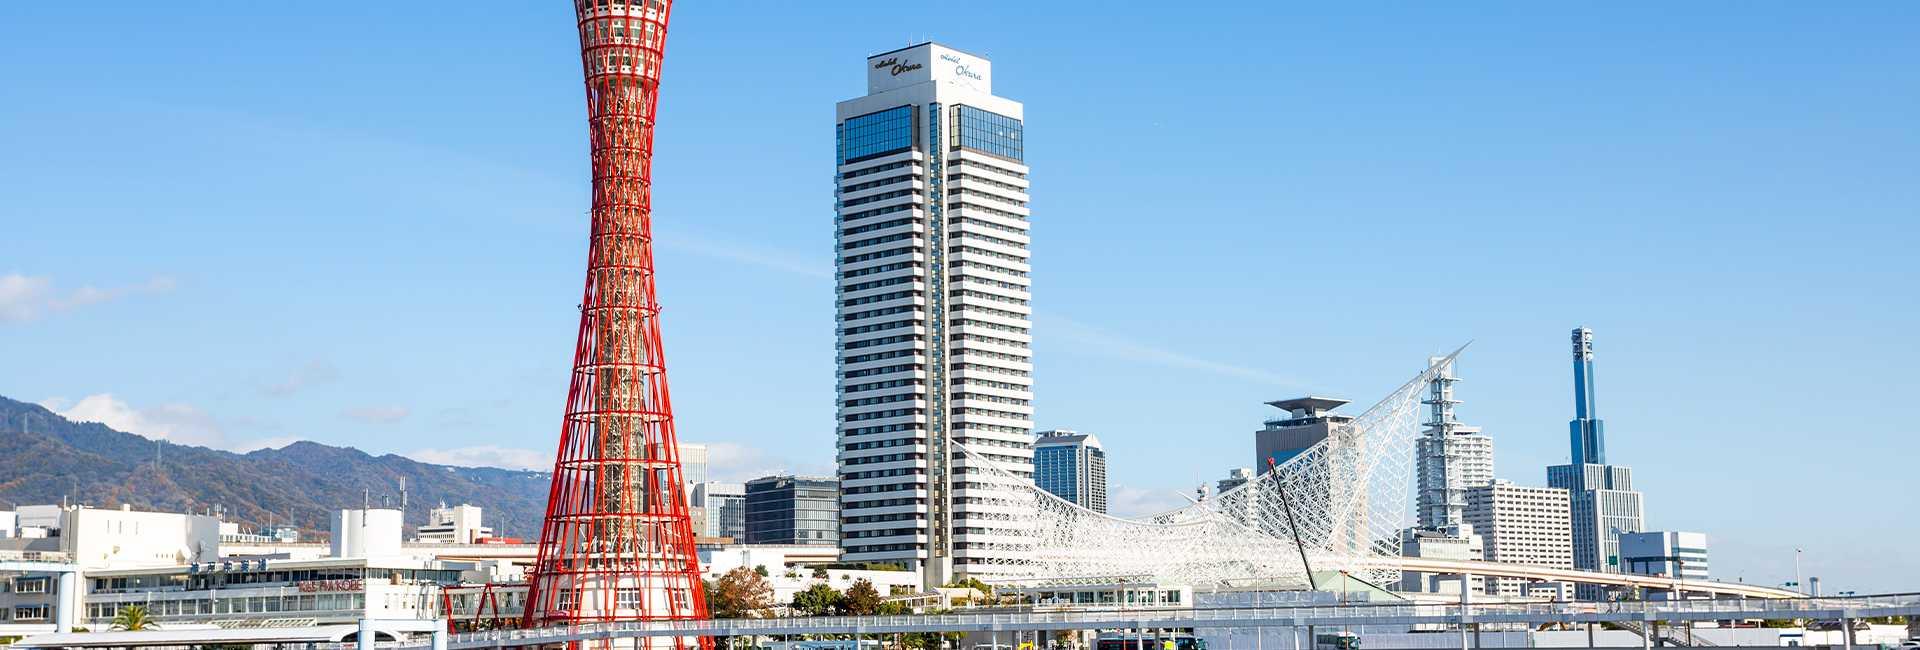 vue du port de Kobe